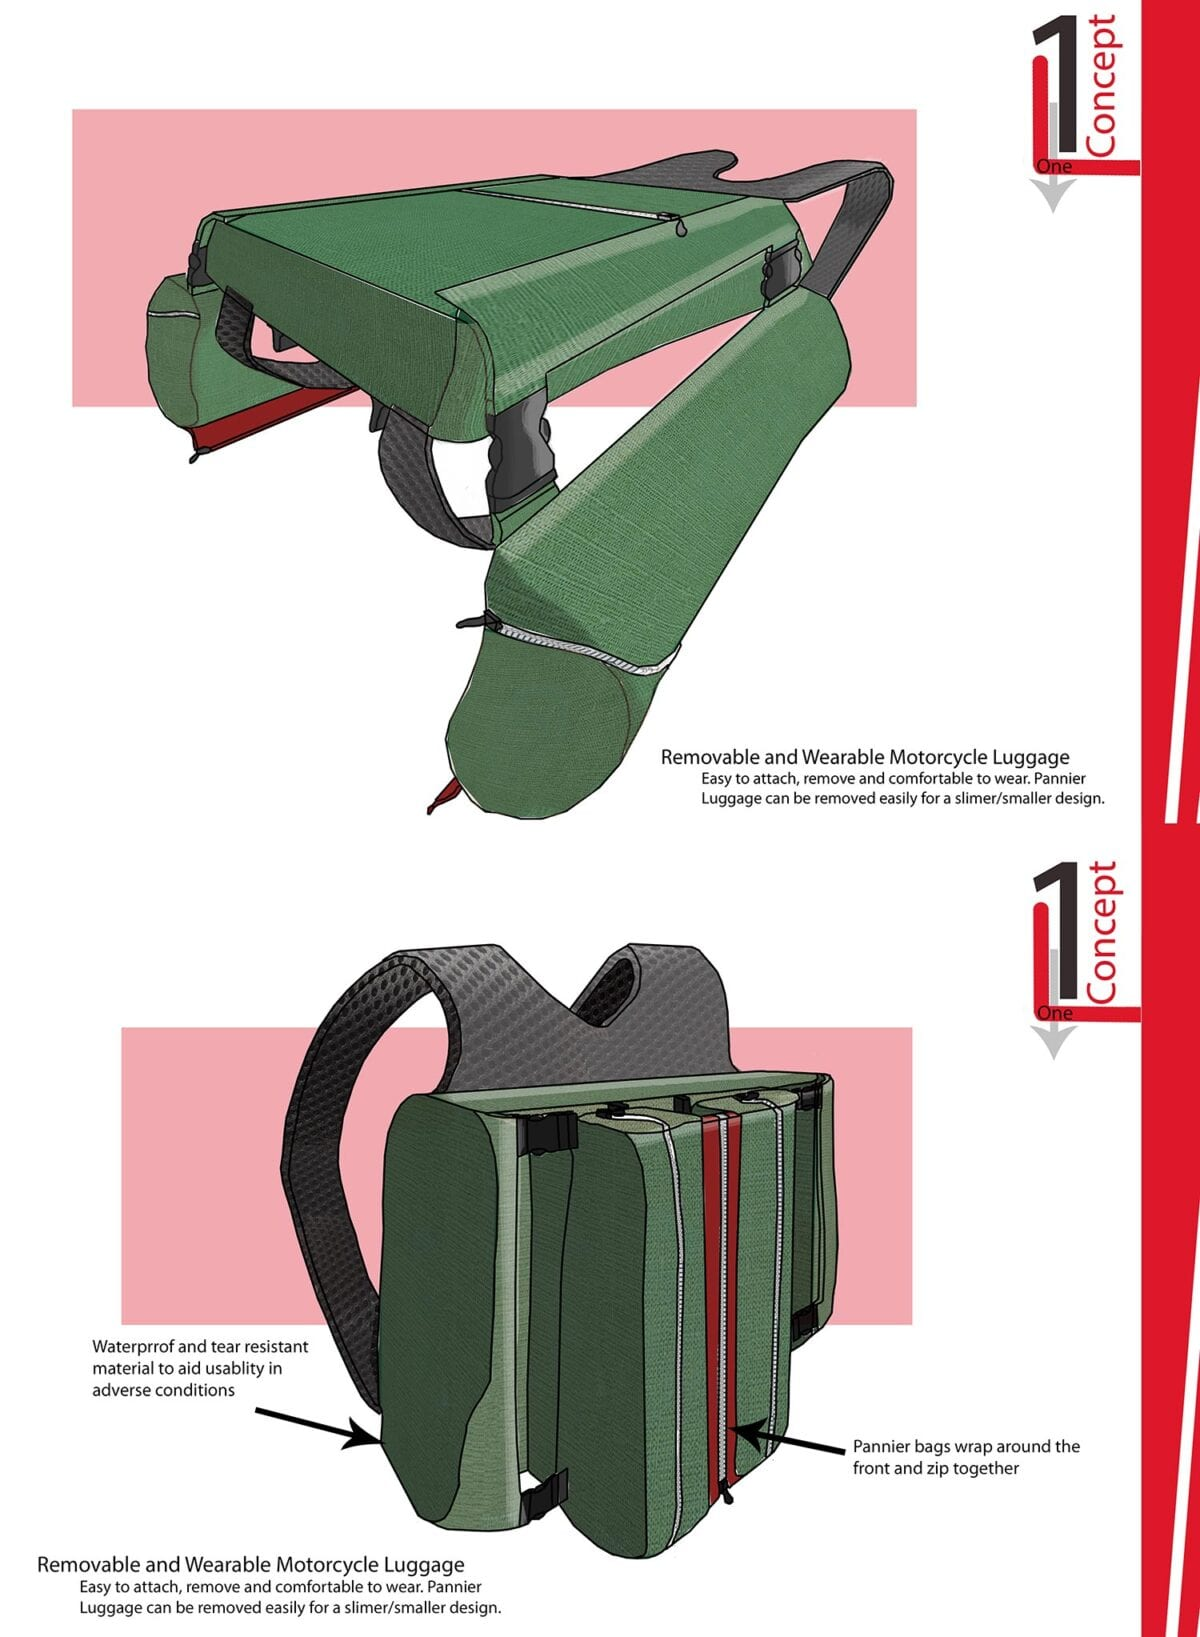 Chris-Stallwood-budget-motorcycle-luggage-001